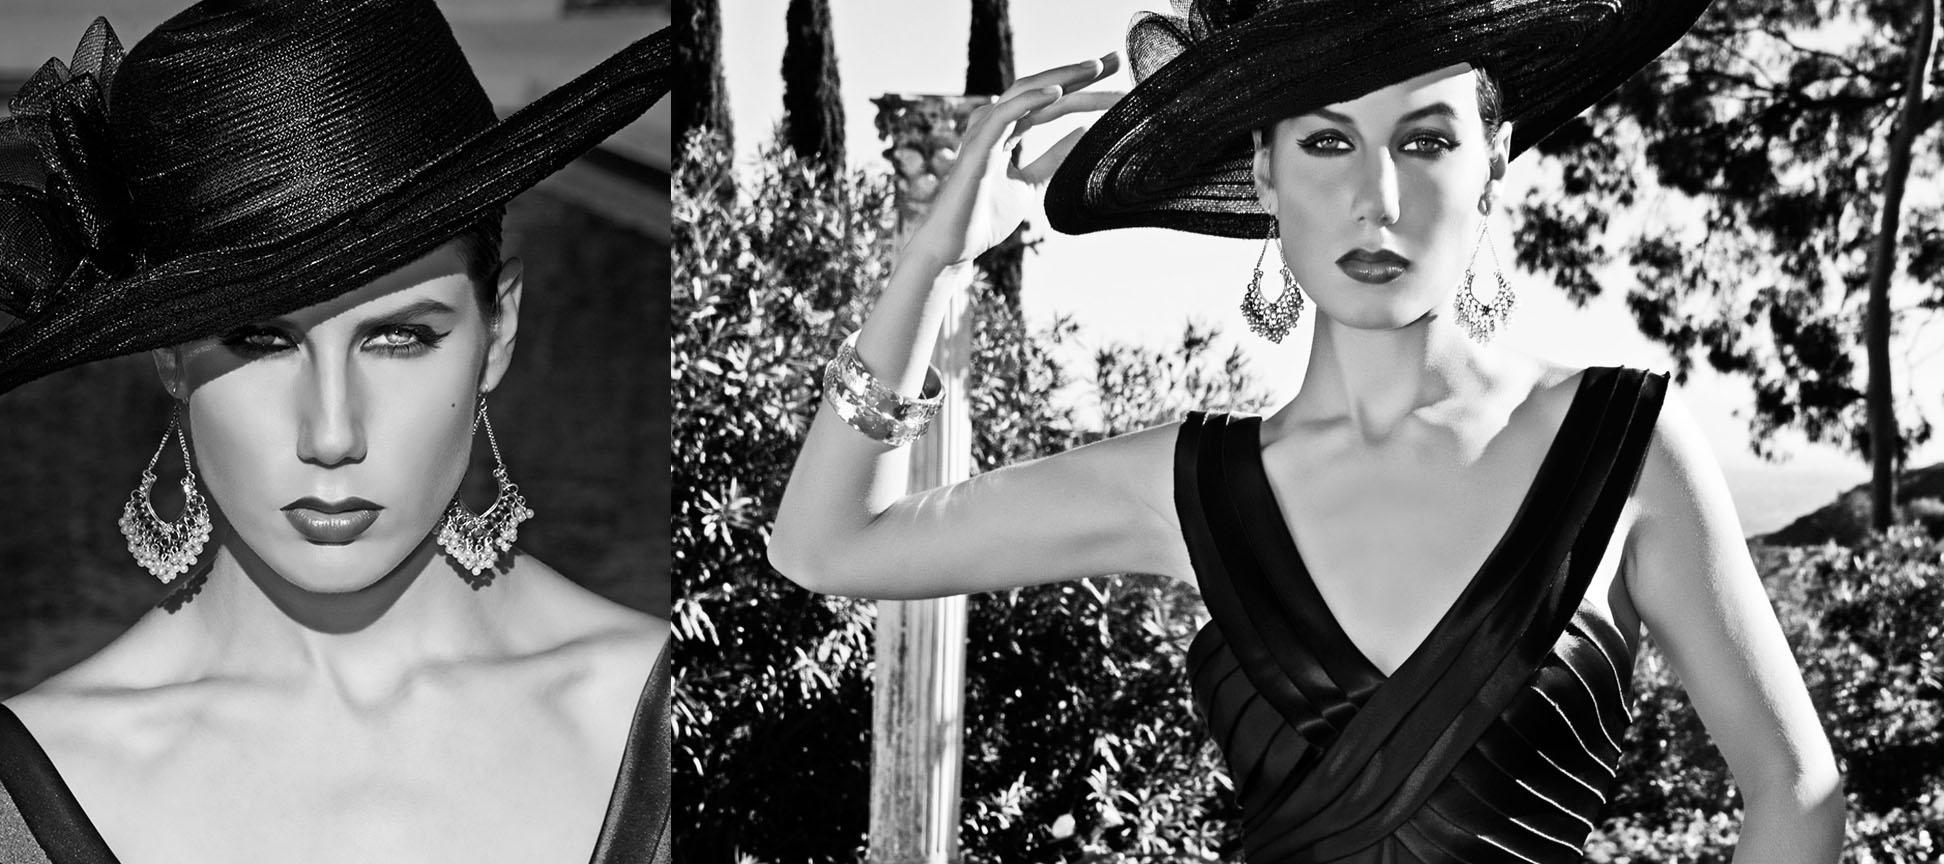 Fashion models photos